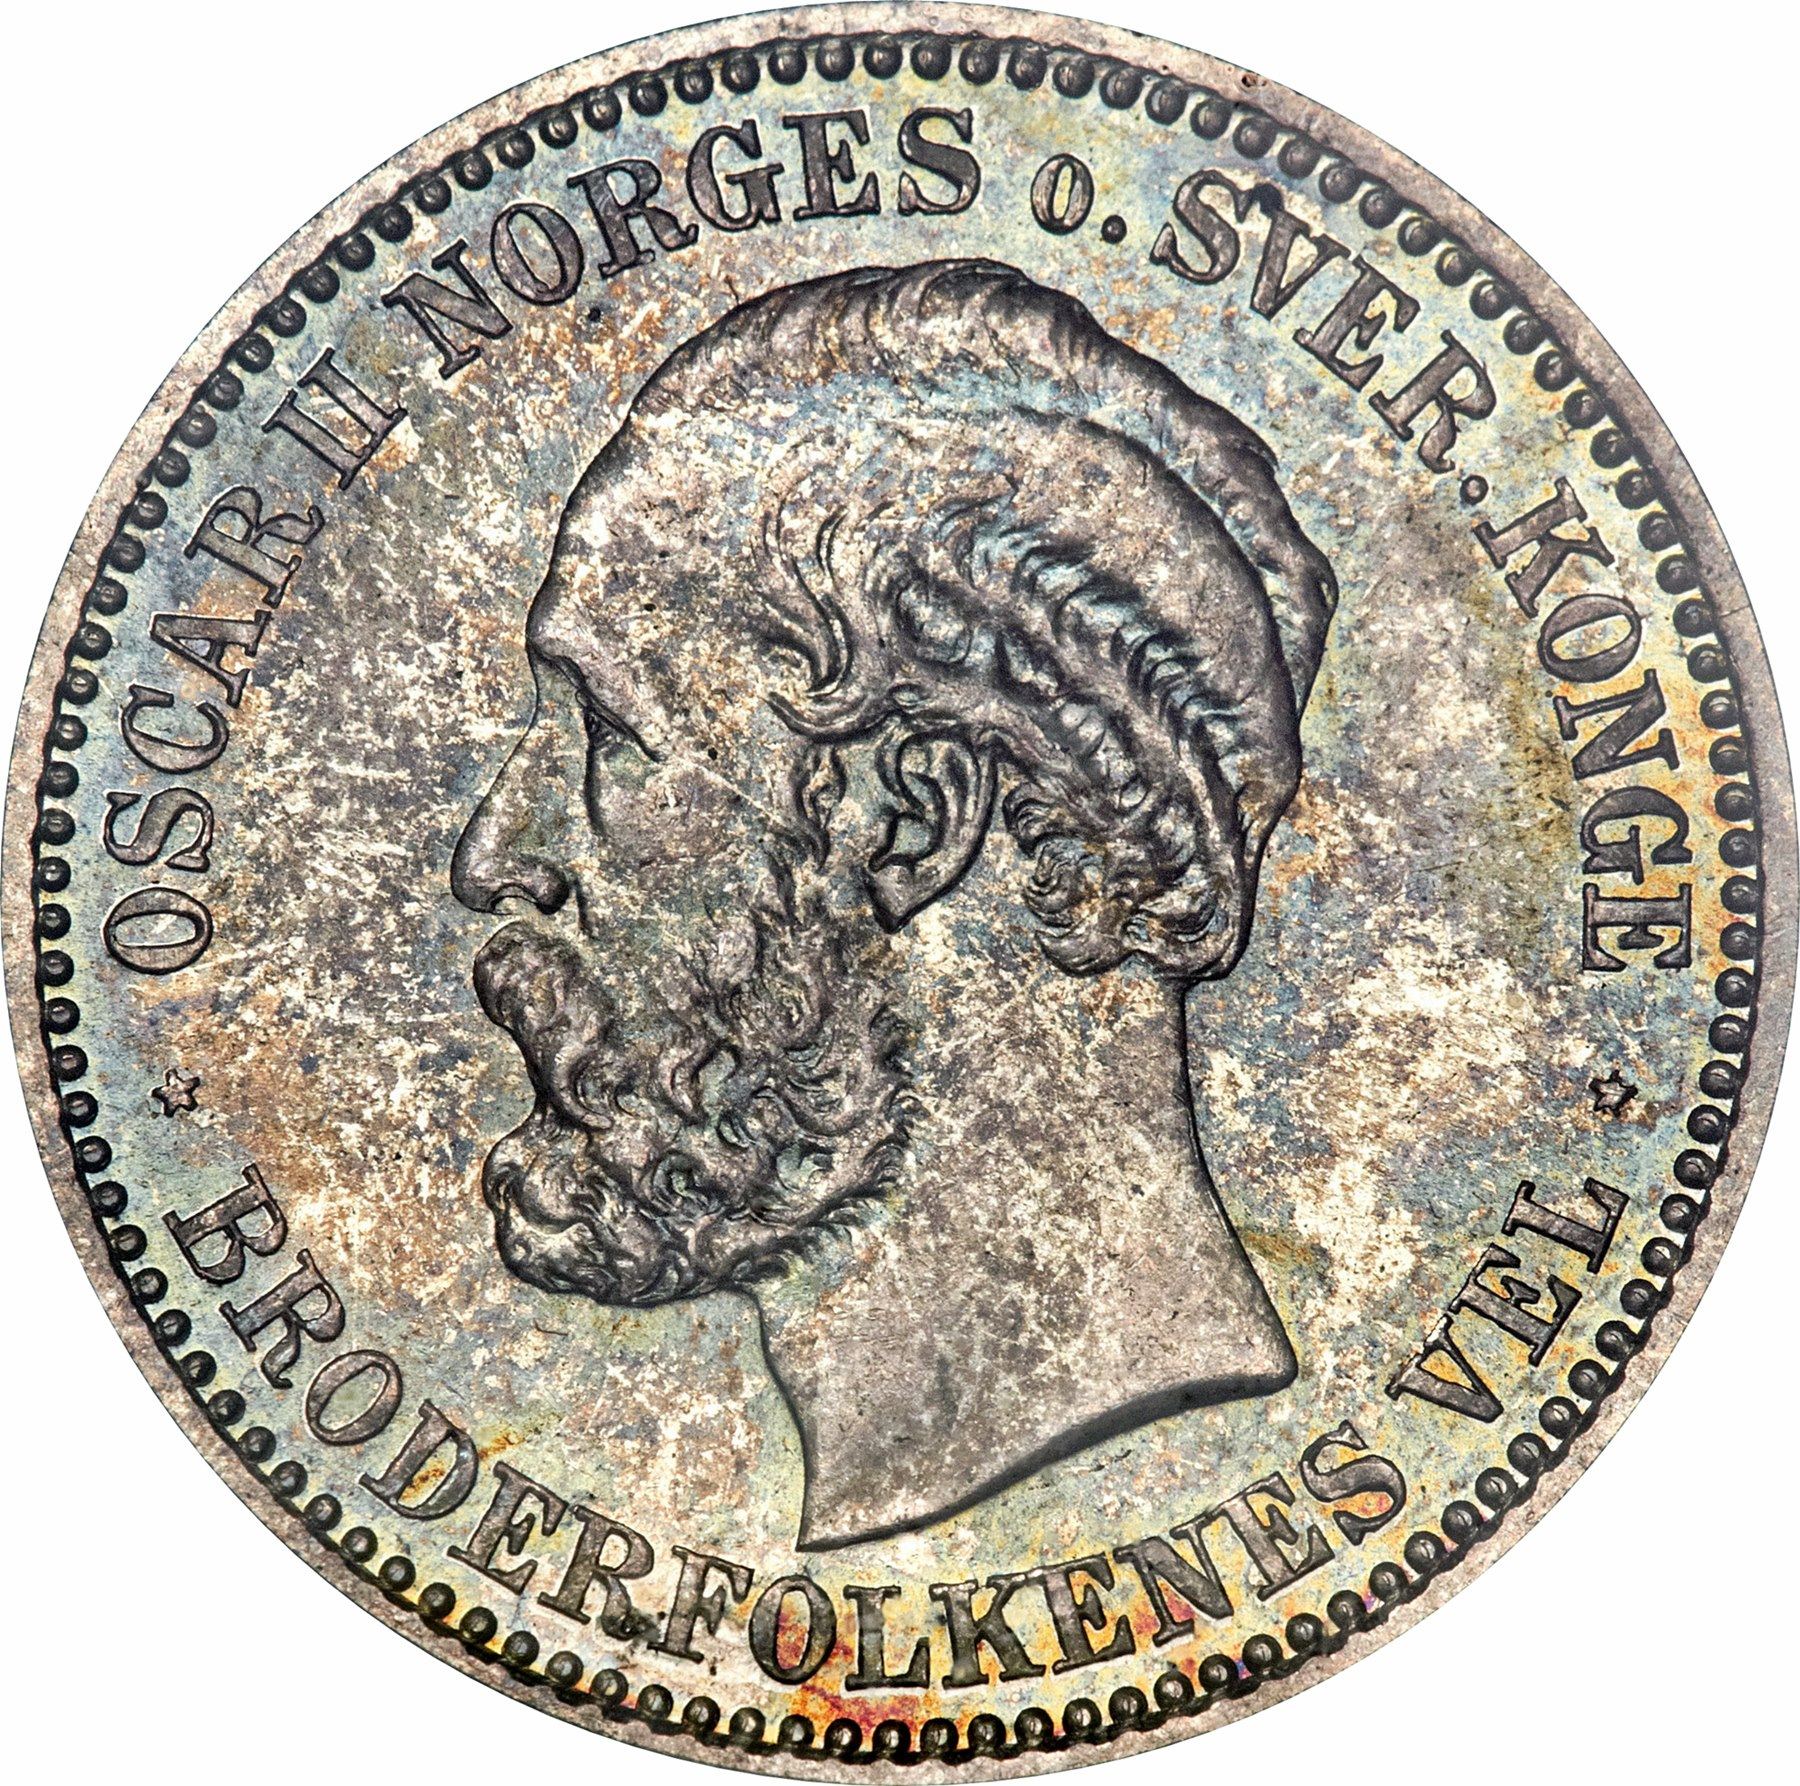 1 Krone - Oscar II - Norway - Numista